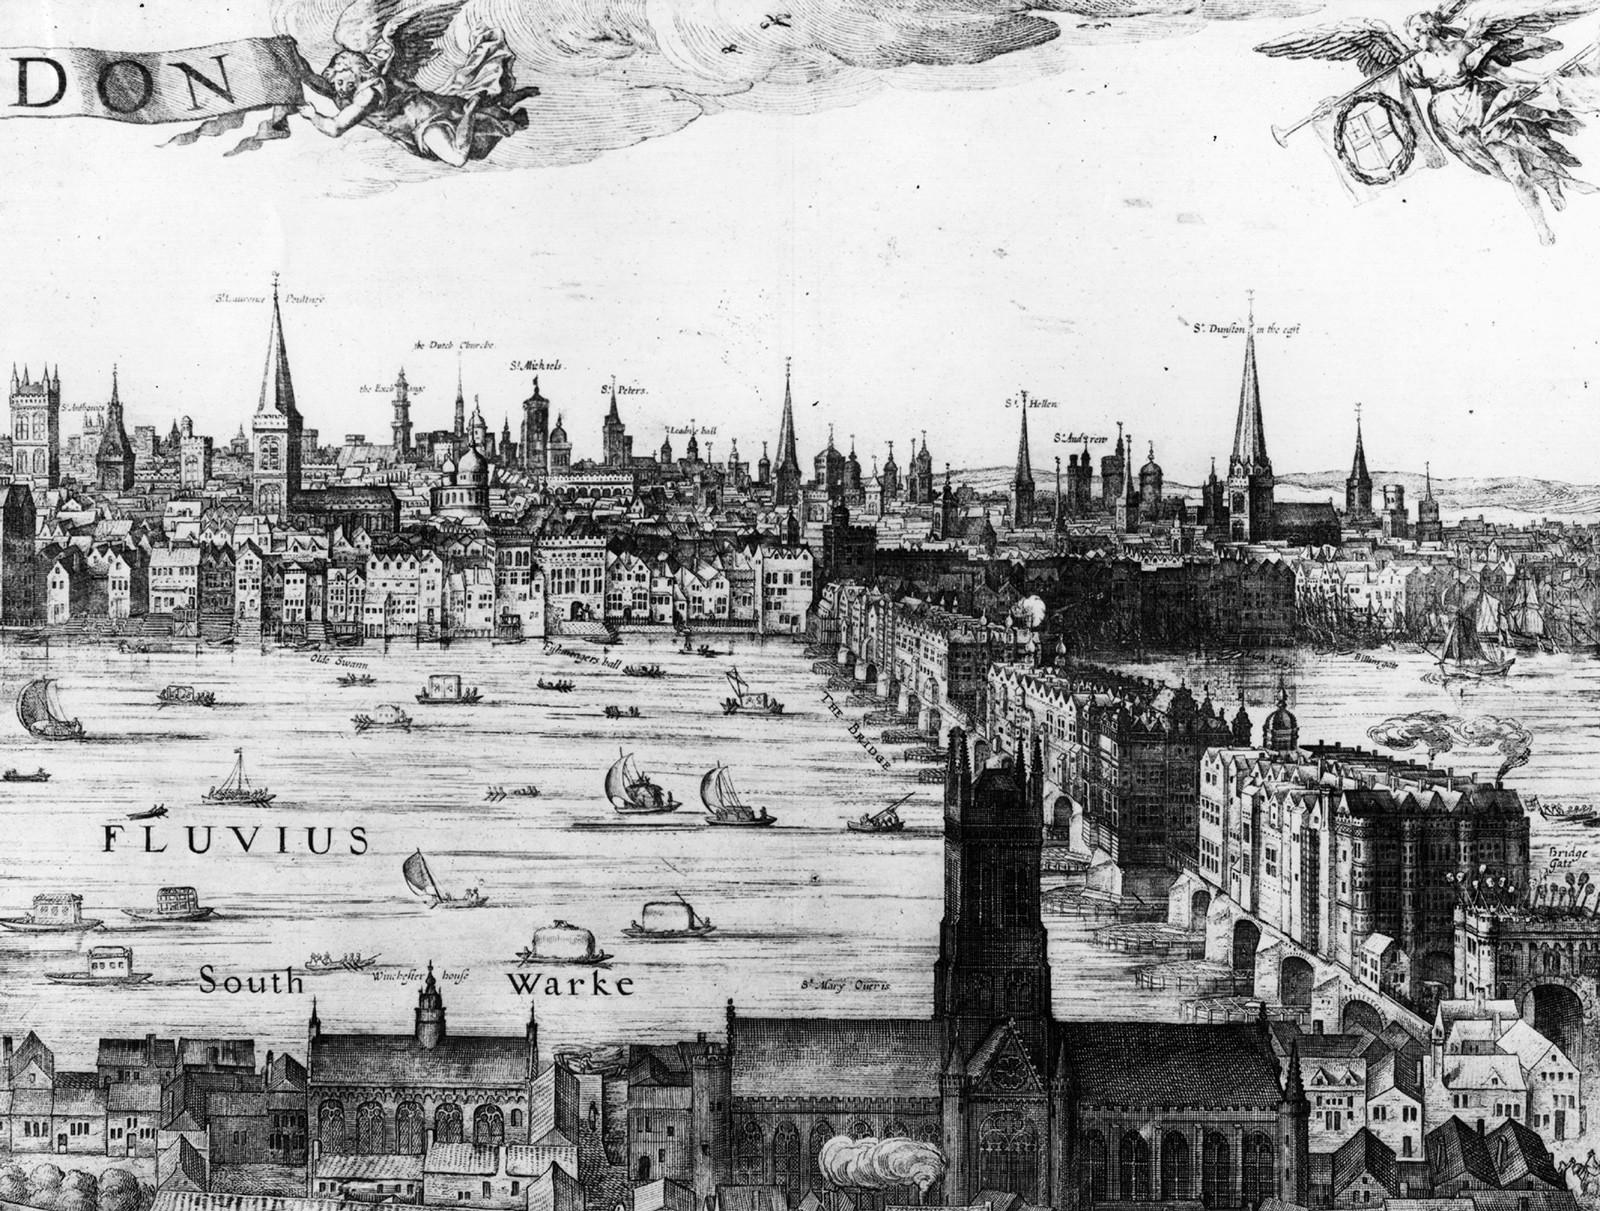 Vischer's Panorama of London, showing London Bridge, 1616.